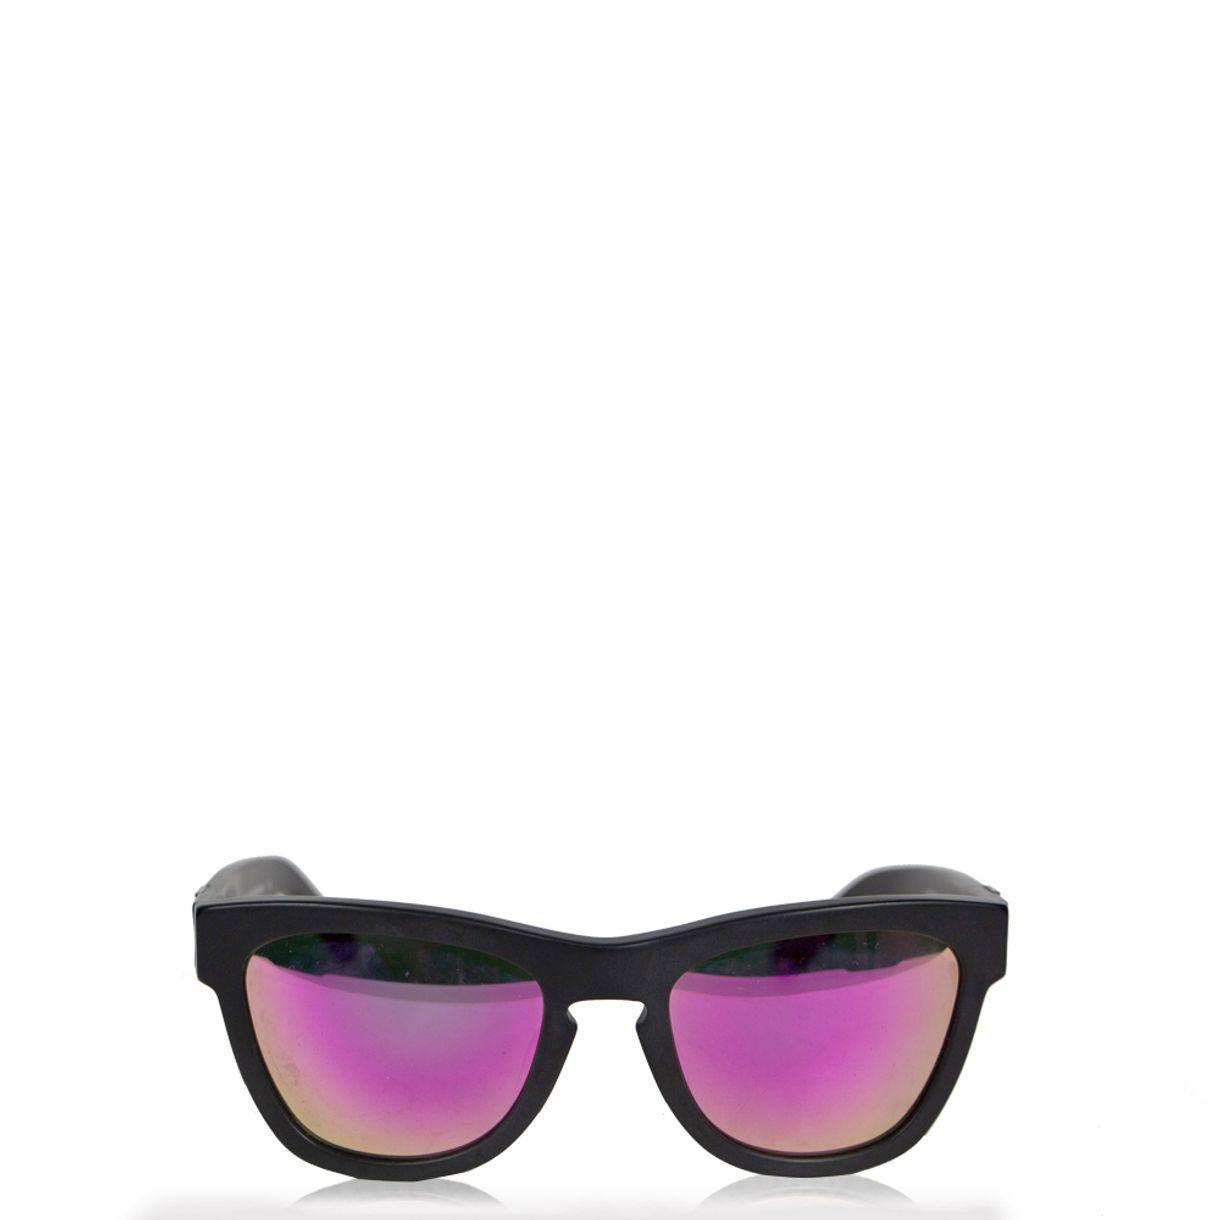 Oculos-Westward-Leaning-Espelhado